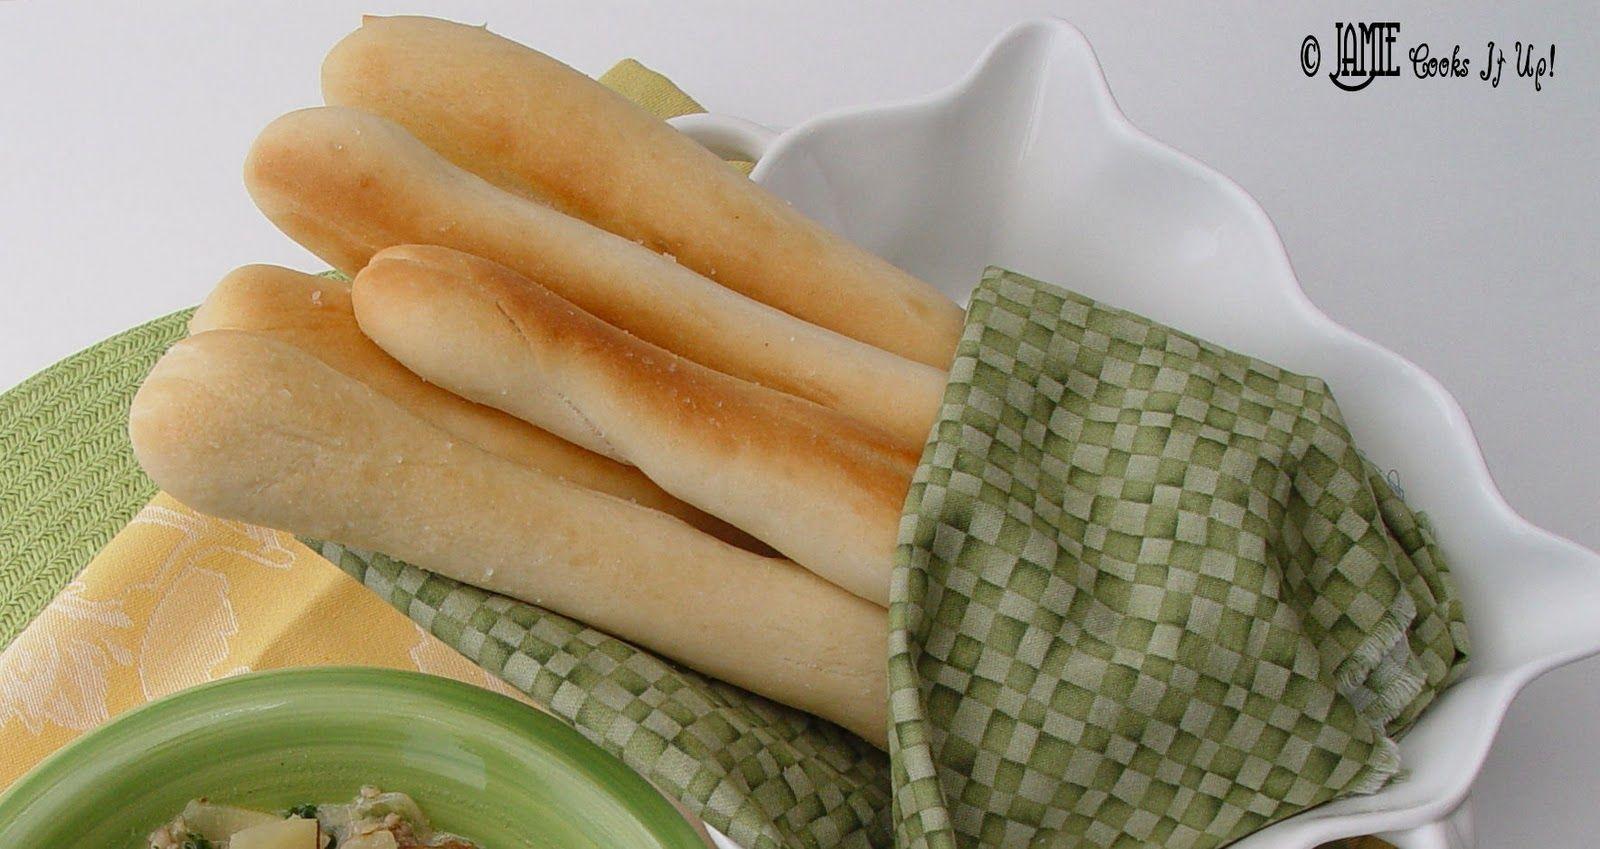 Olive Garden Breadsticks Recipes As Good As The Original Recipe Olive Garden Breadsticks Breadsticks Copycat Recipes